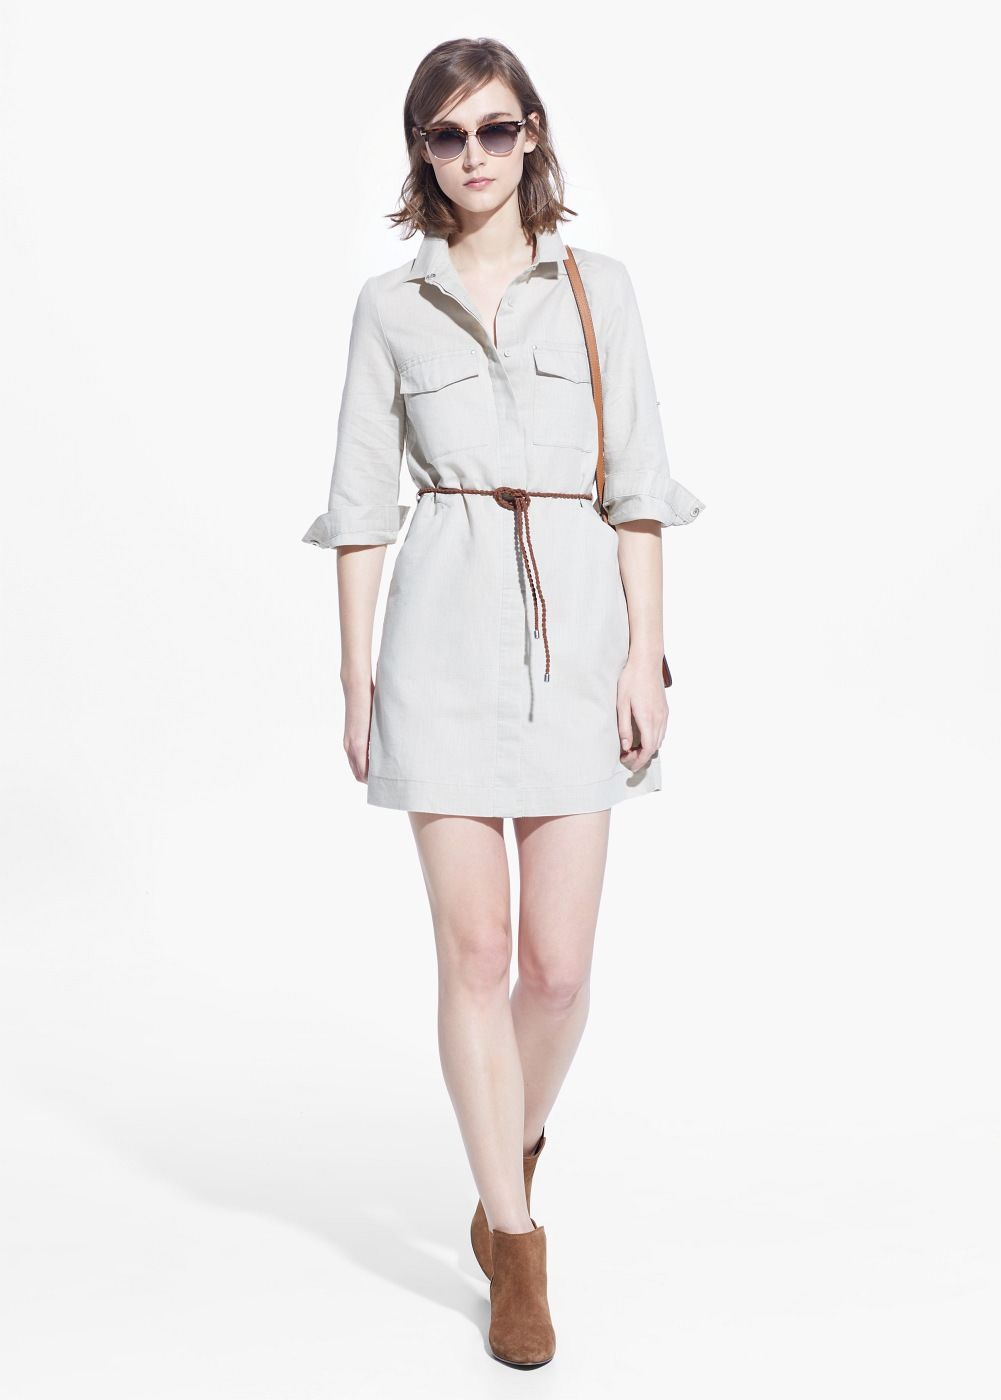 21c08829a Vestido camisero lino - Mujer